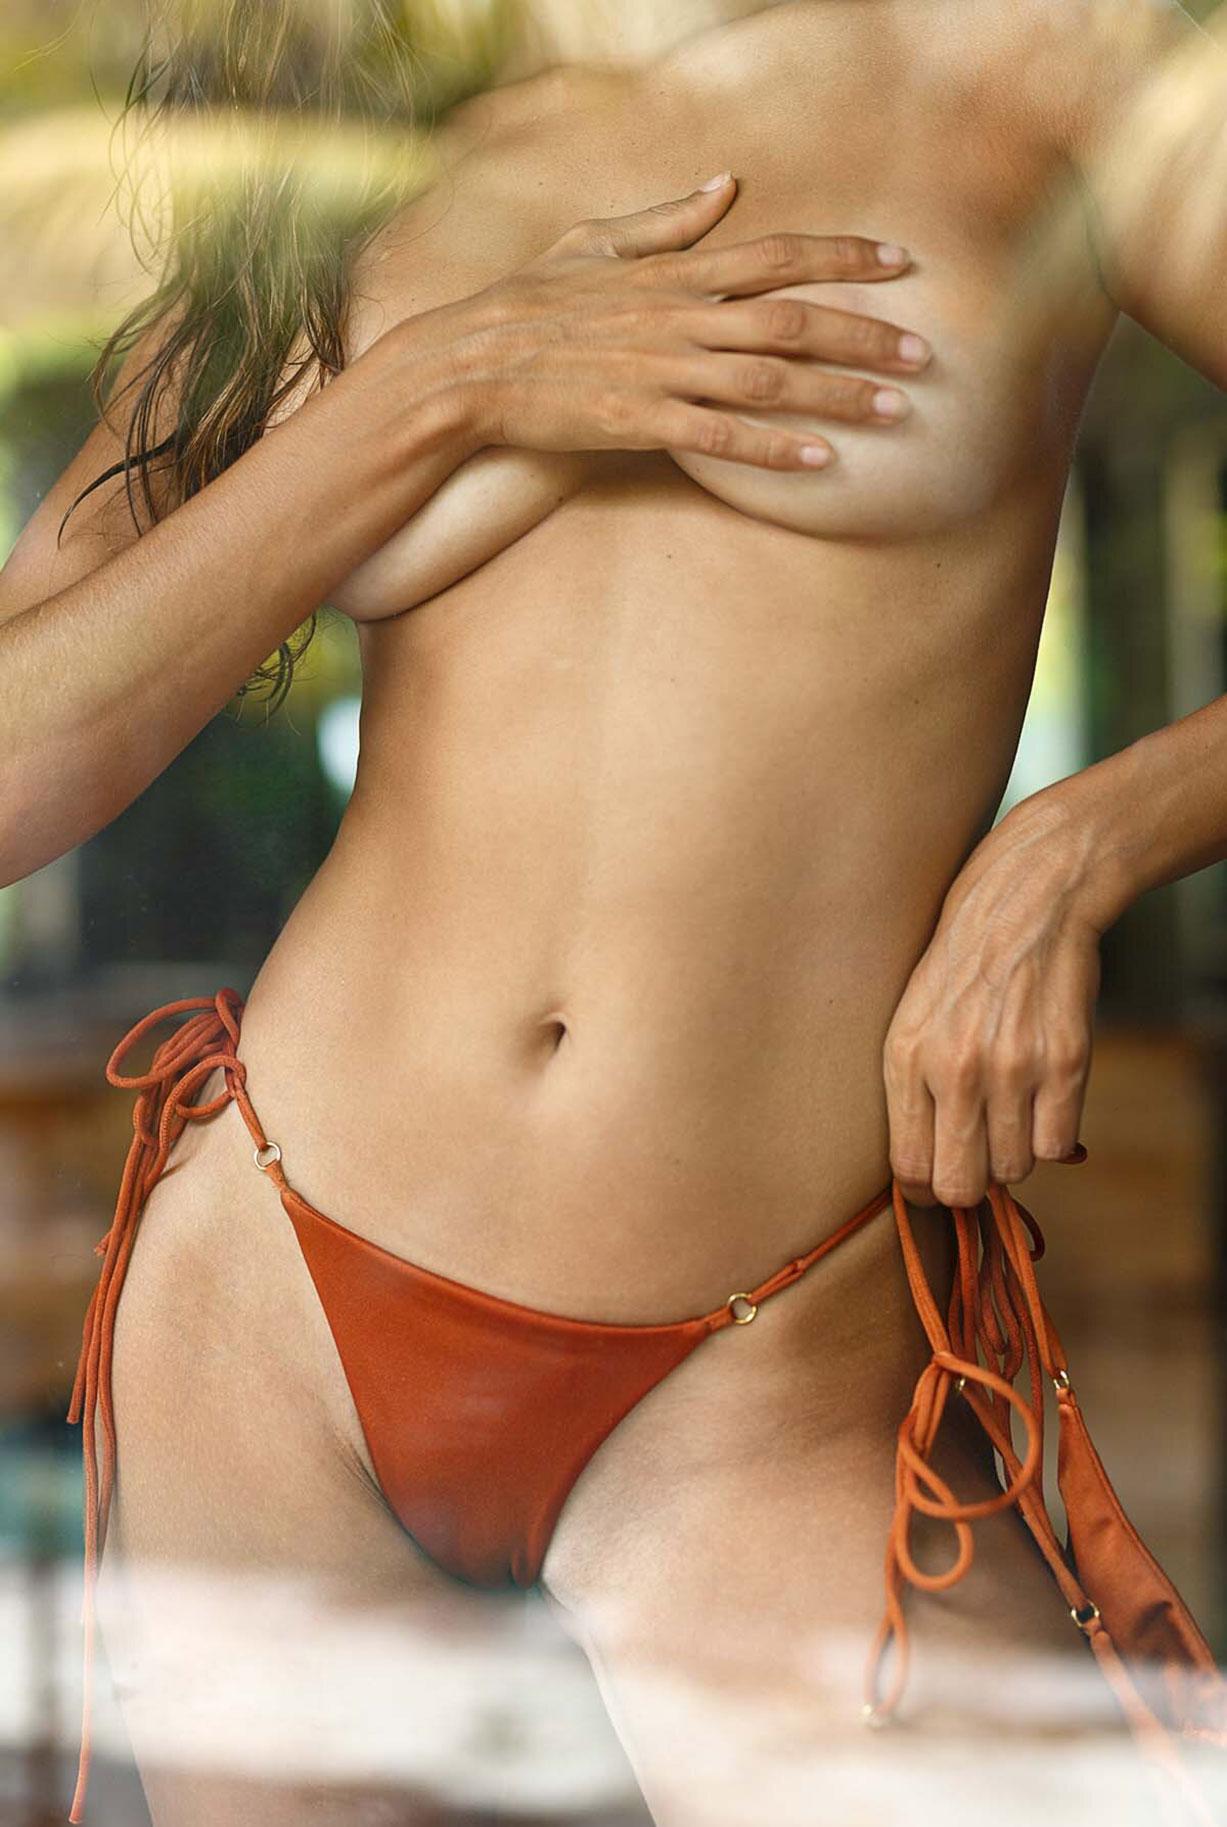 Найара Лима отдыхает у бассейна на Бали / фото 15